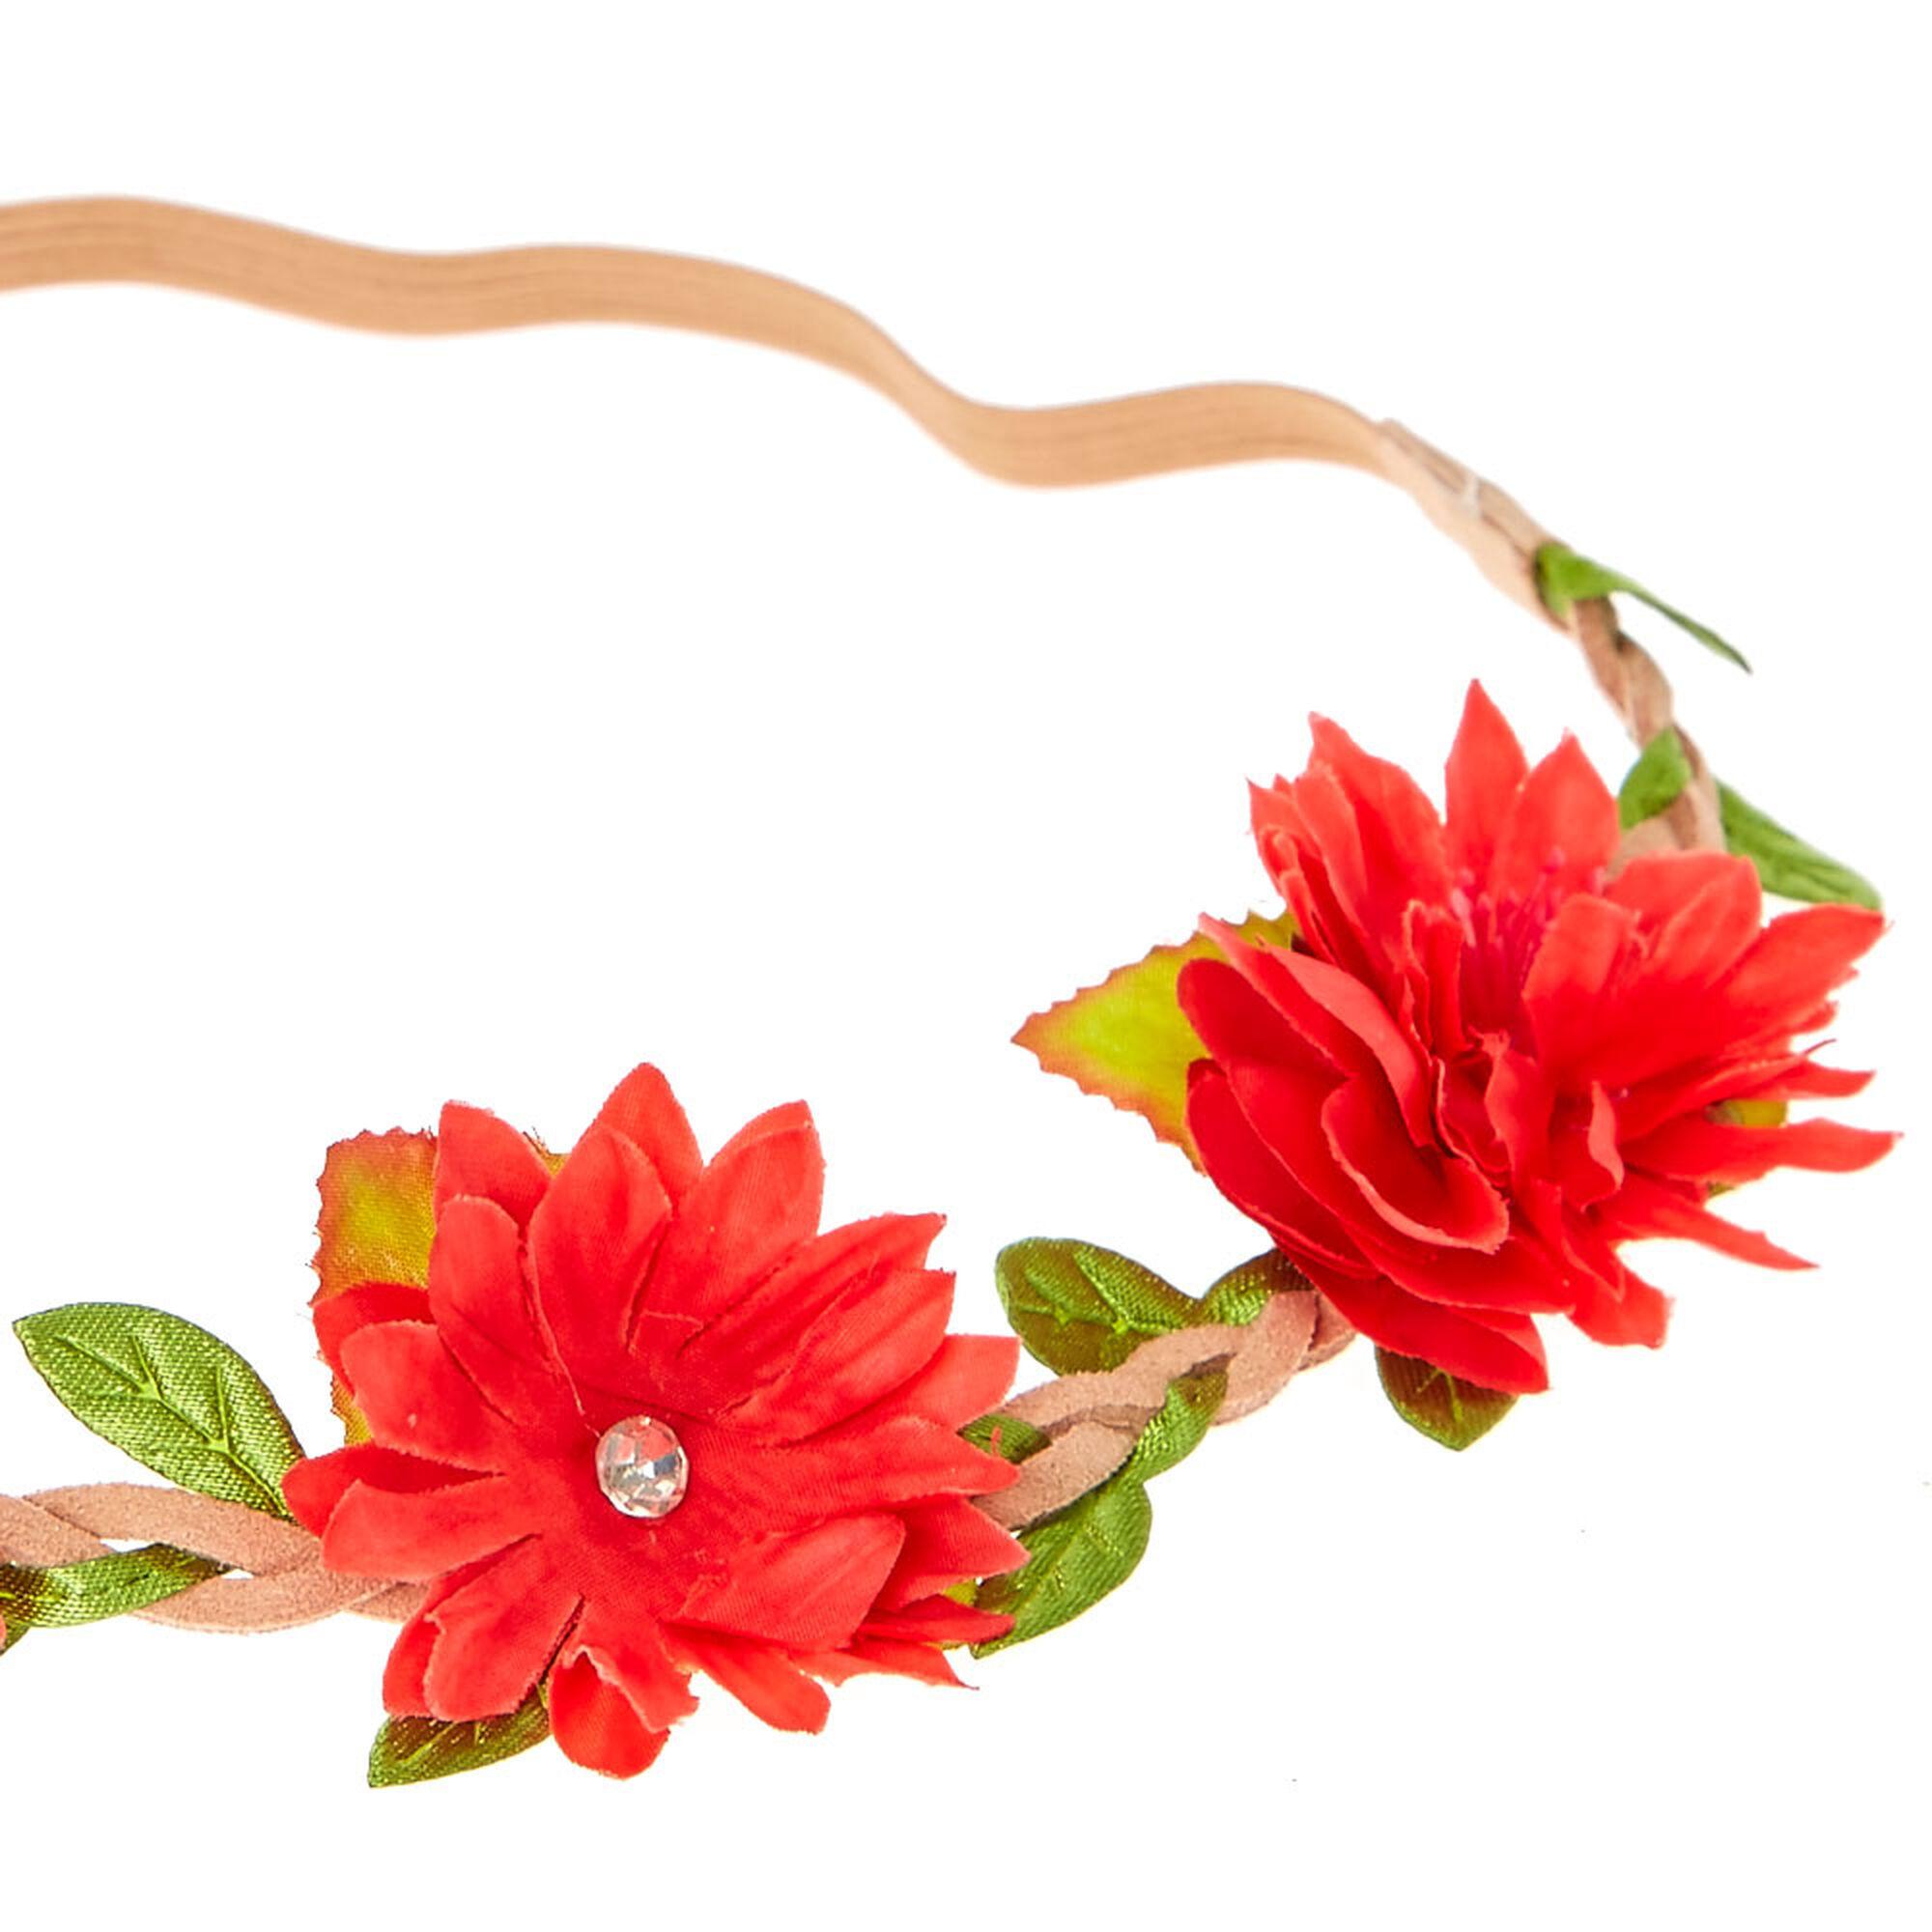 Red daisy flower headwrap claires red daisy flower headwrap izmirmasajfo